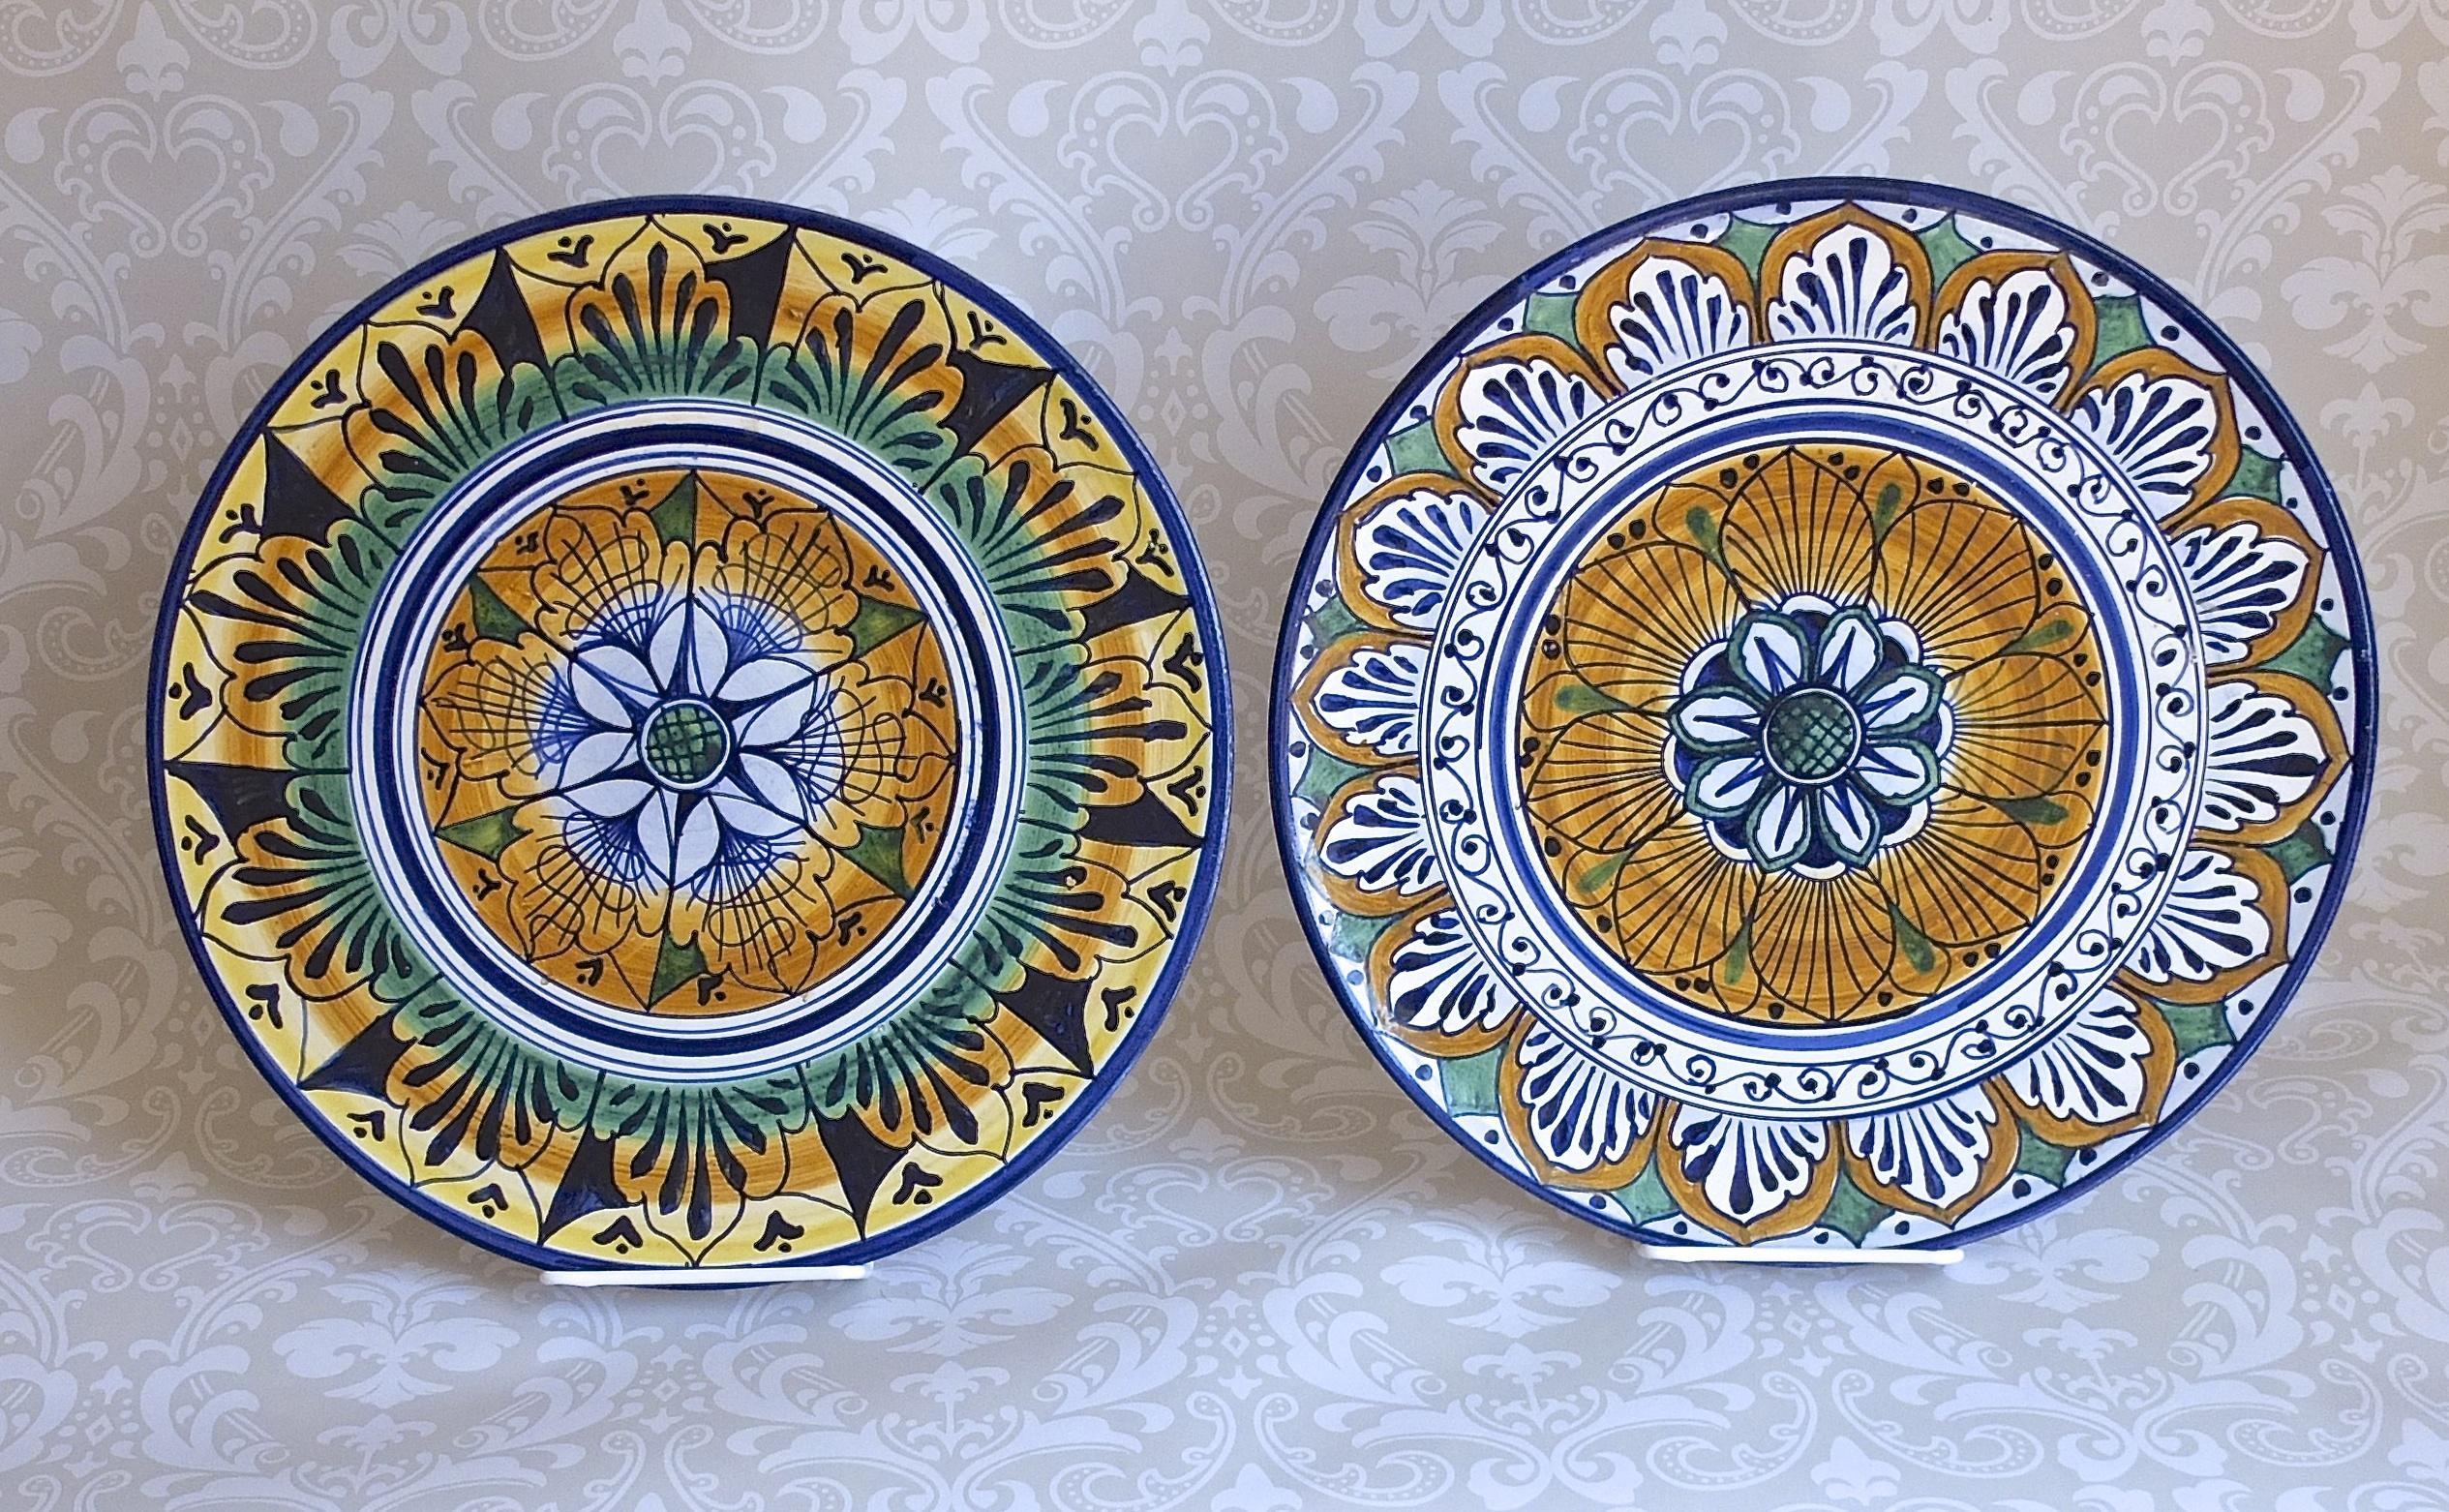 Timeless Elegance Of Italian Ceramic Dinnerware ~ Home Decorations Regarding Italian Ceramic Wall Art (Image 16 of 20)